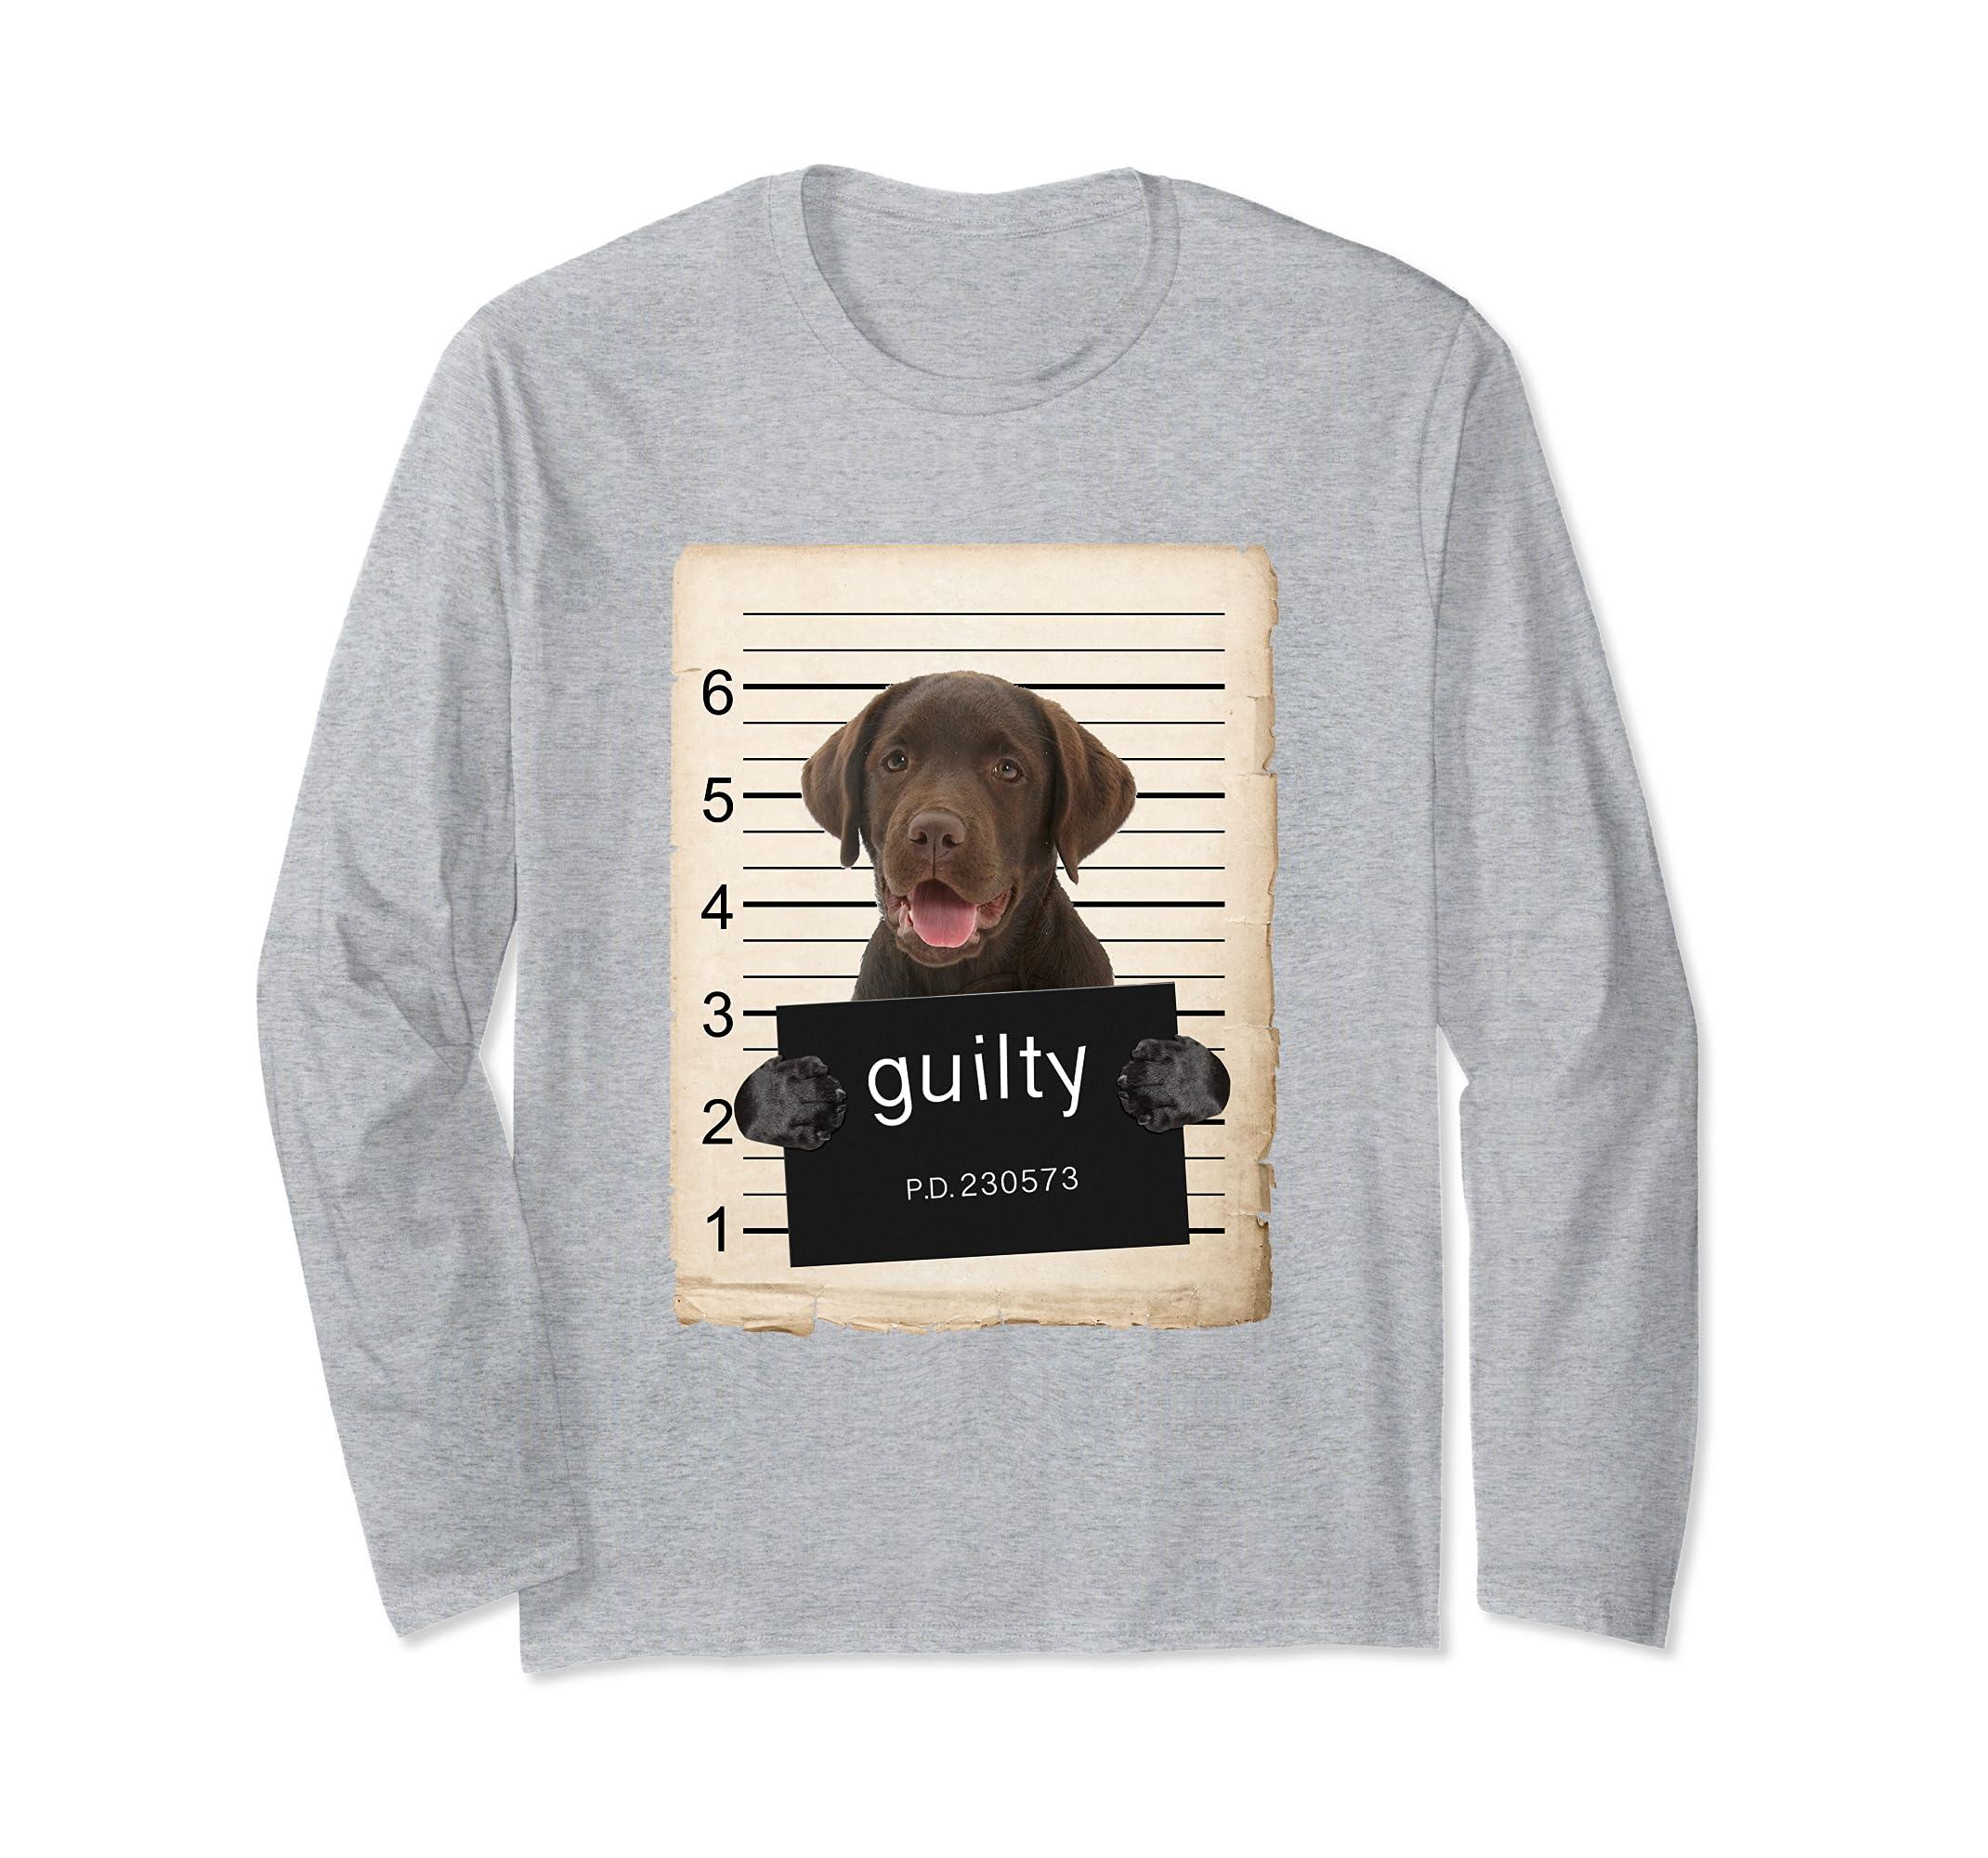 chocolate Labrador Dog mug shot Long Sleeve Shirt-ln